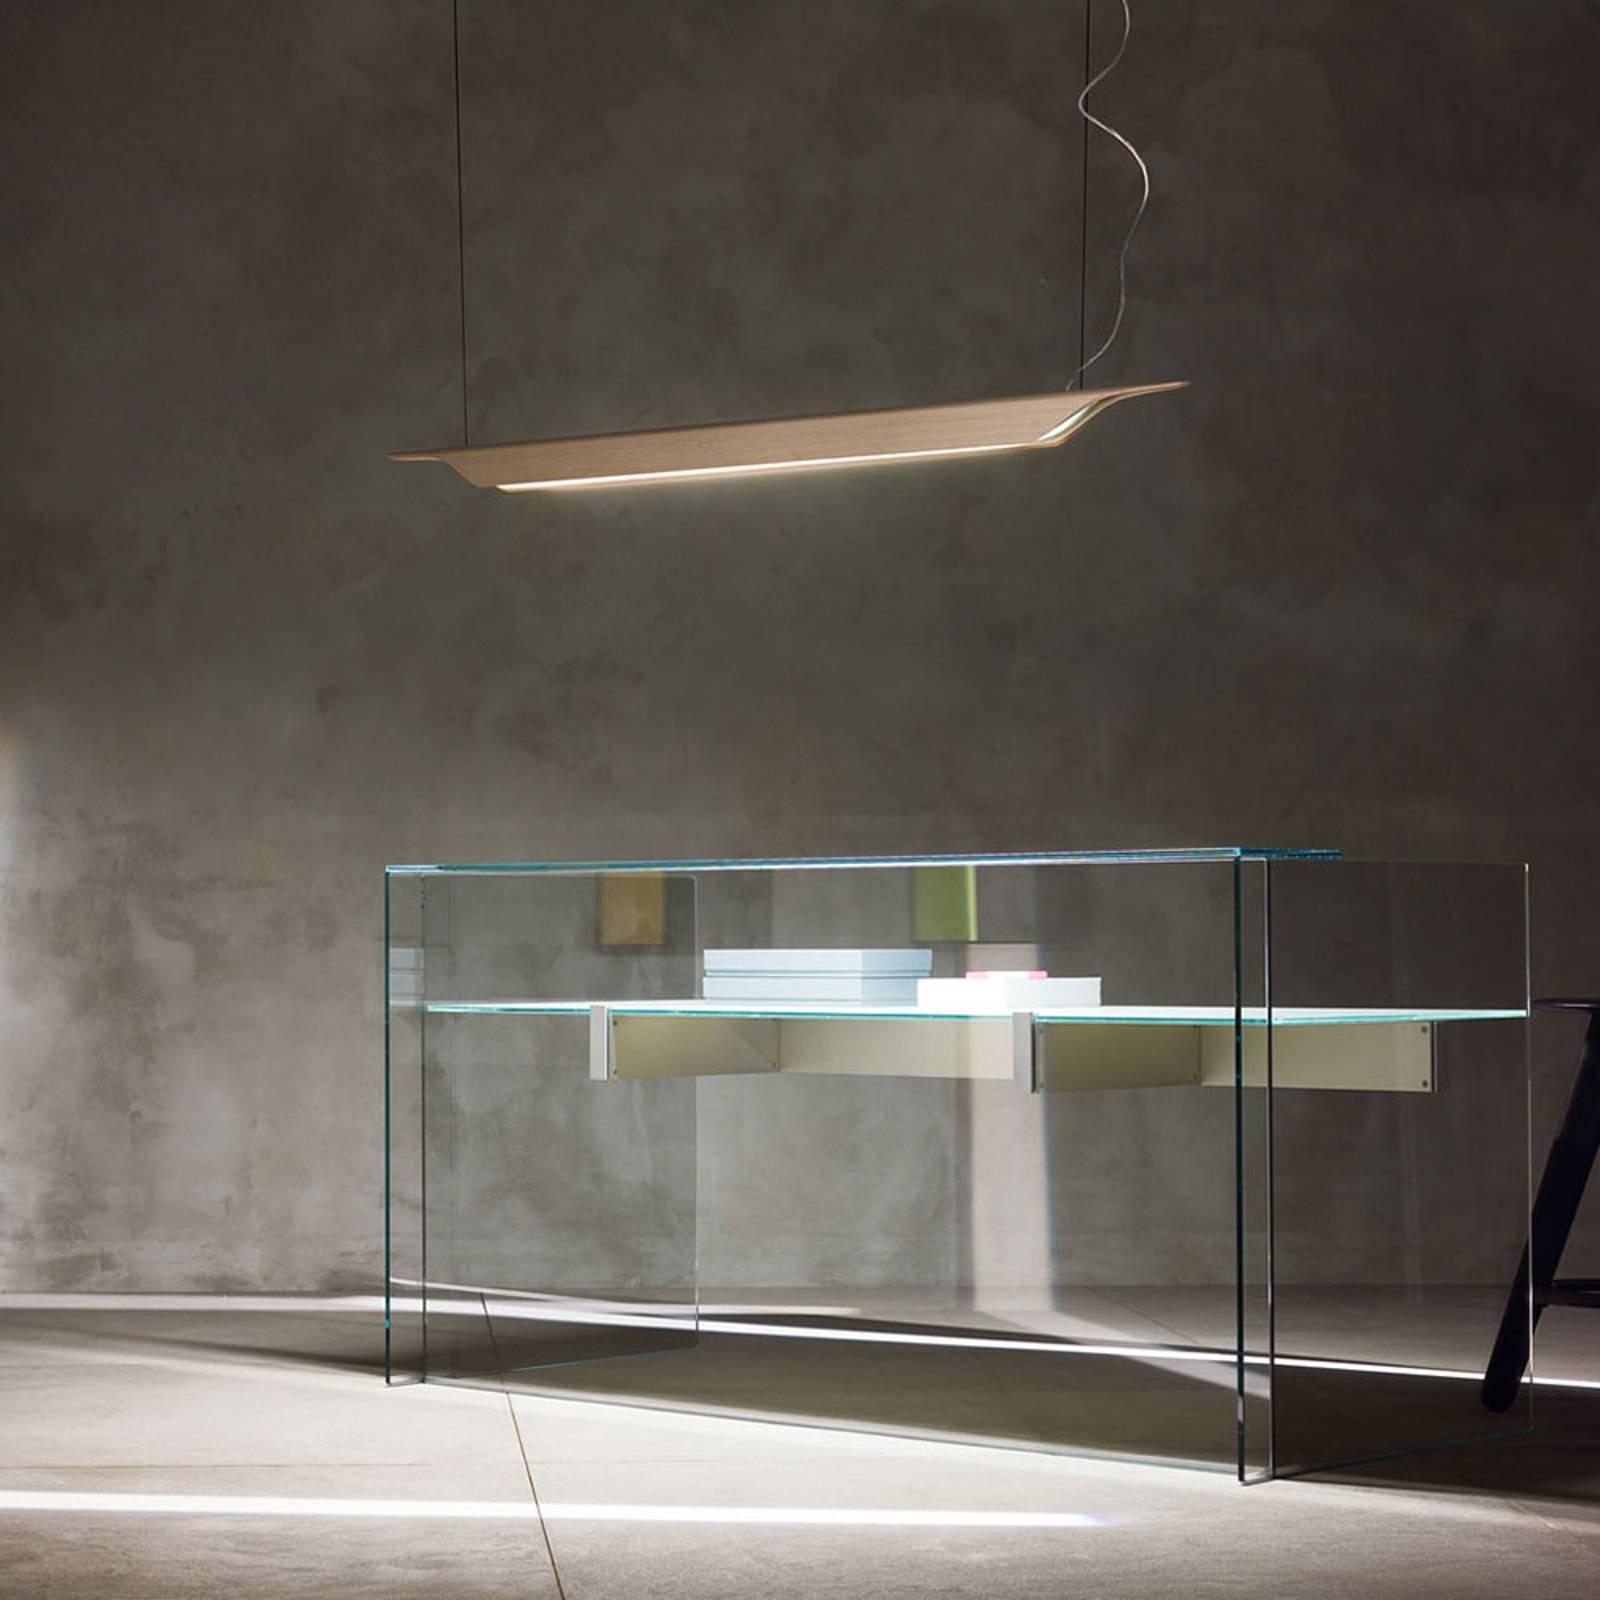 Foscarini Troag M LED-Hängeleuchte aus Holz, natur